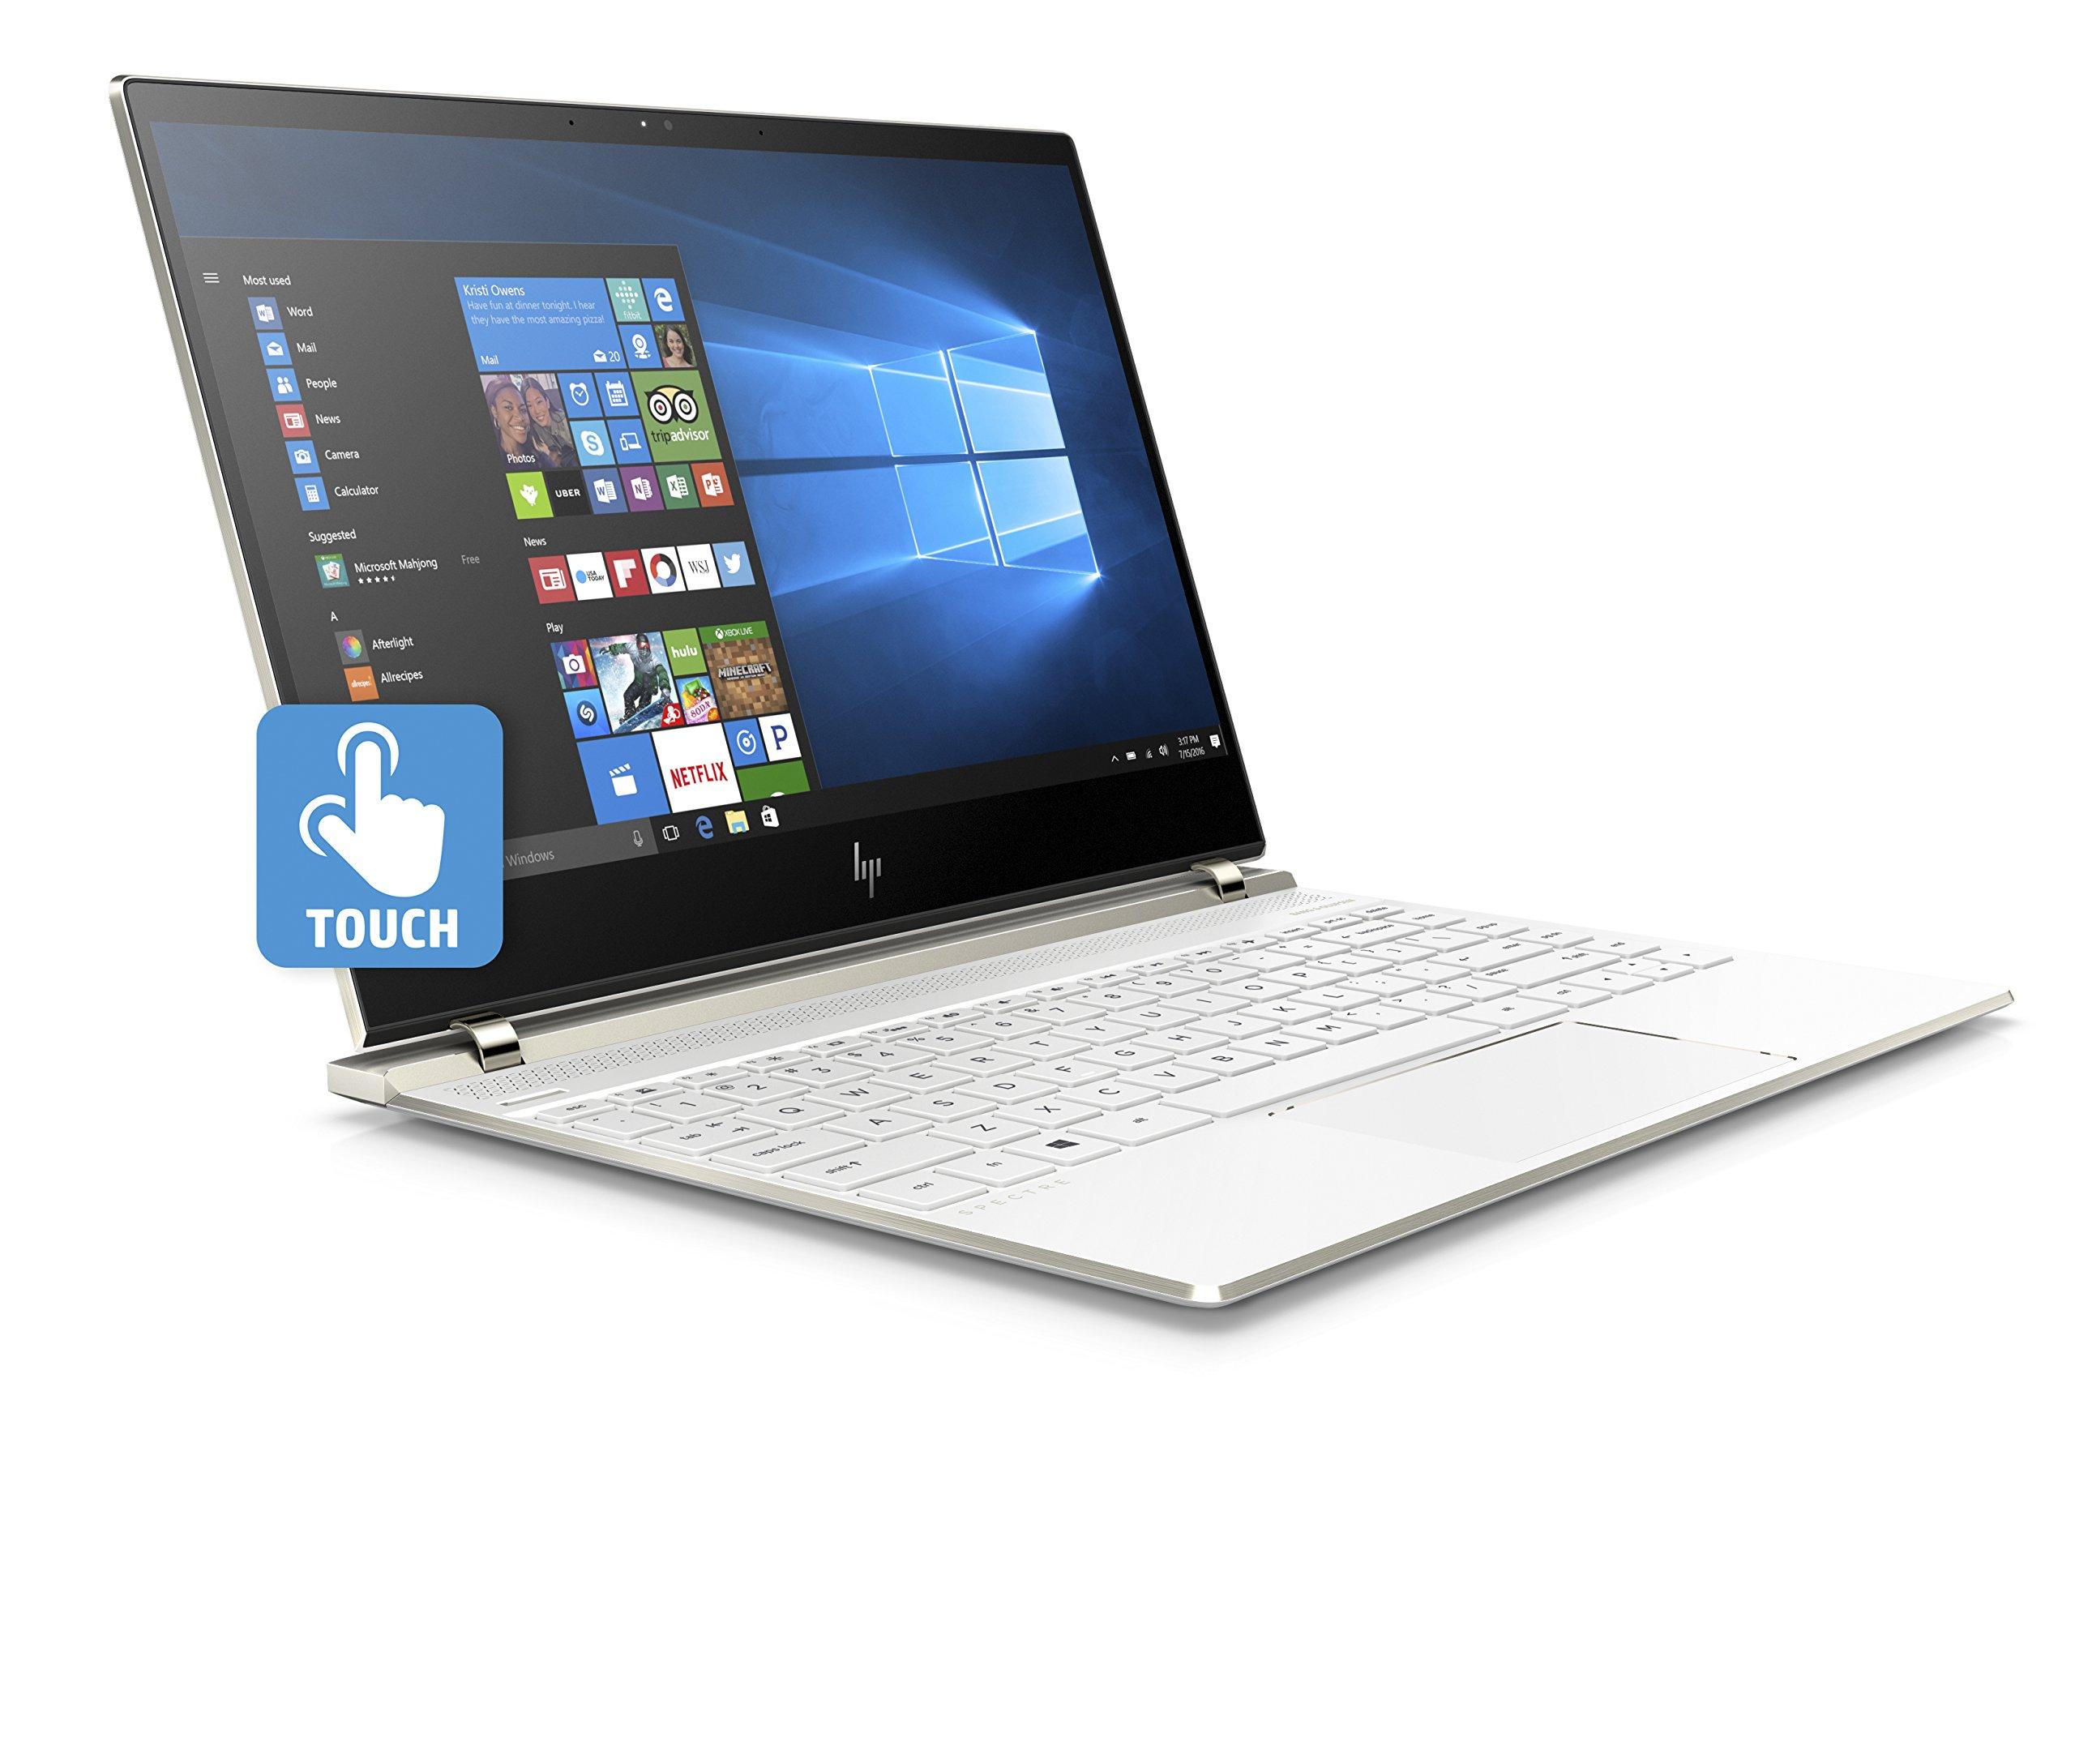 HP-PC Spectre 13-af002nl Notebook